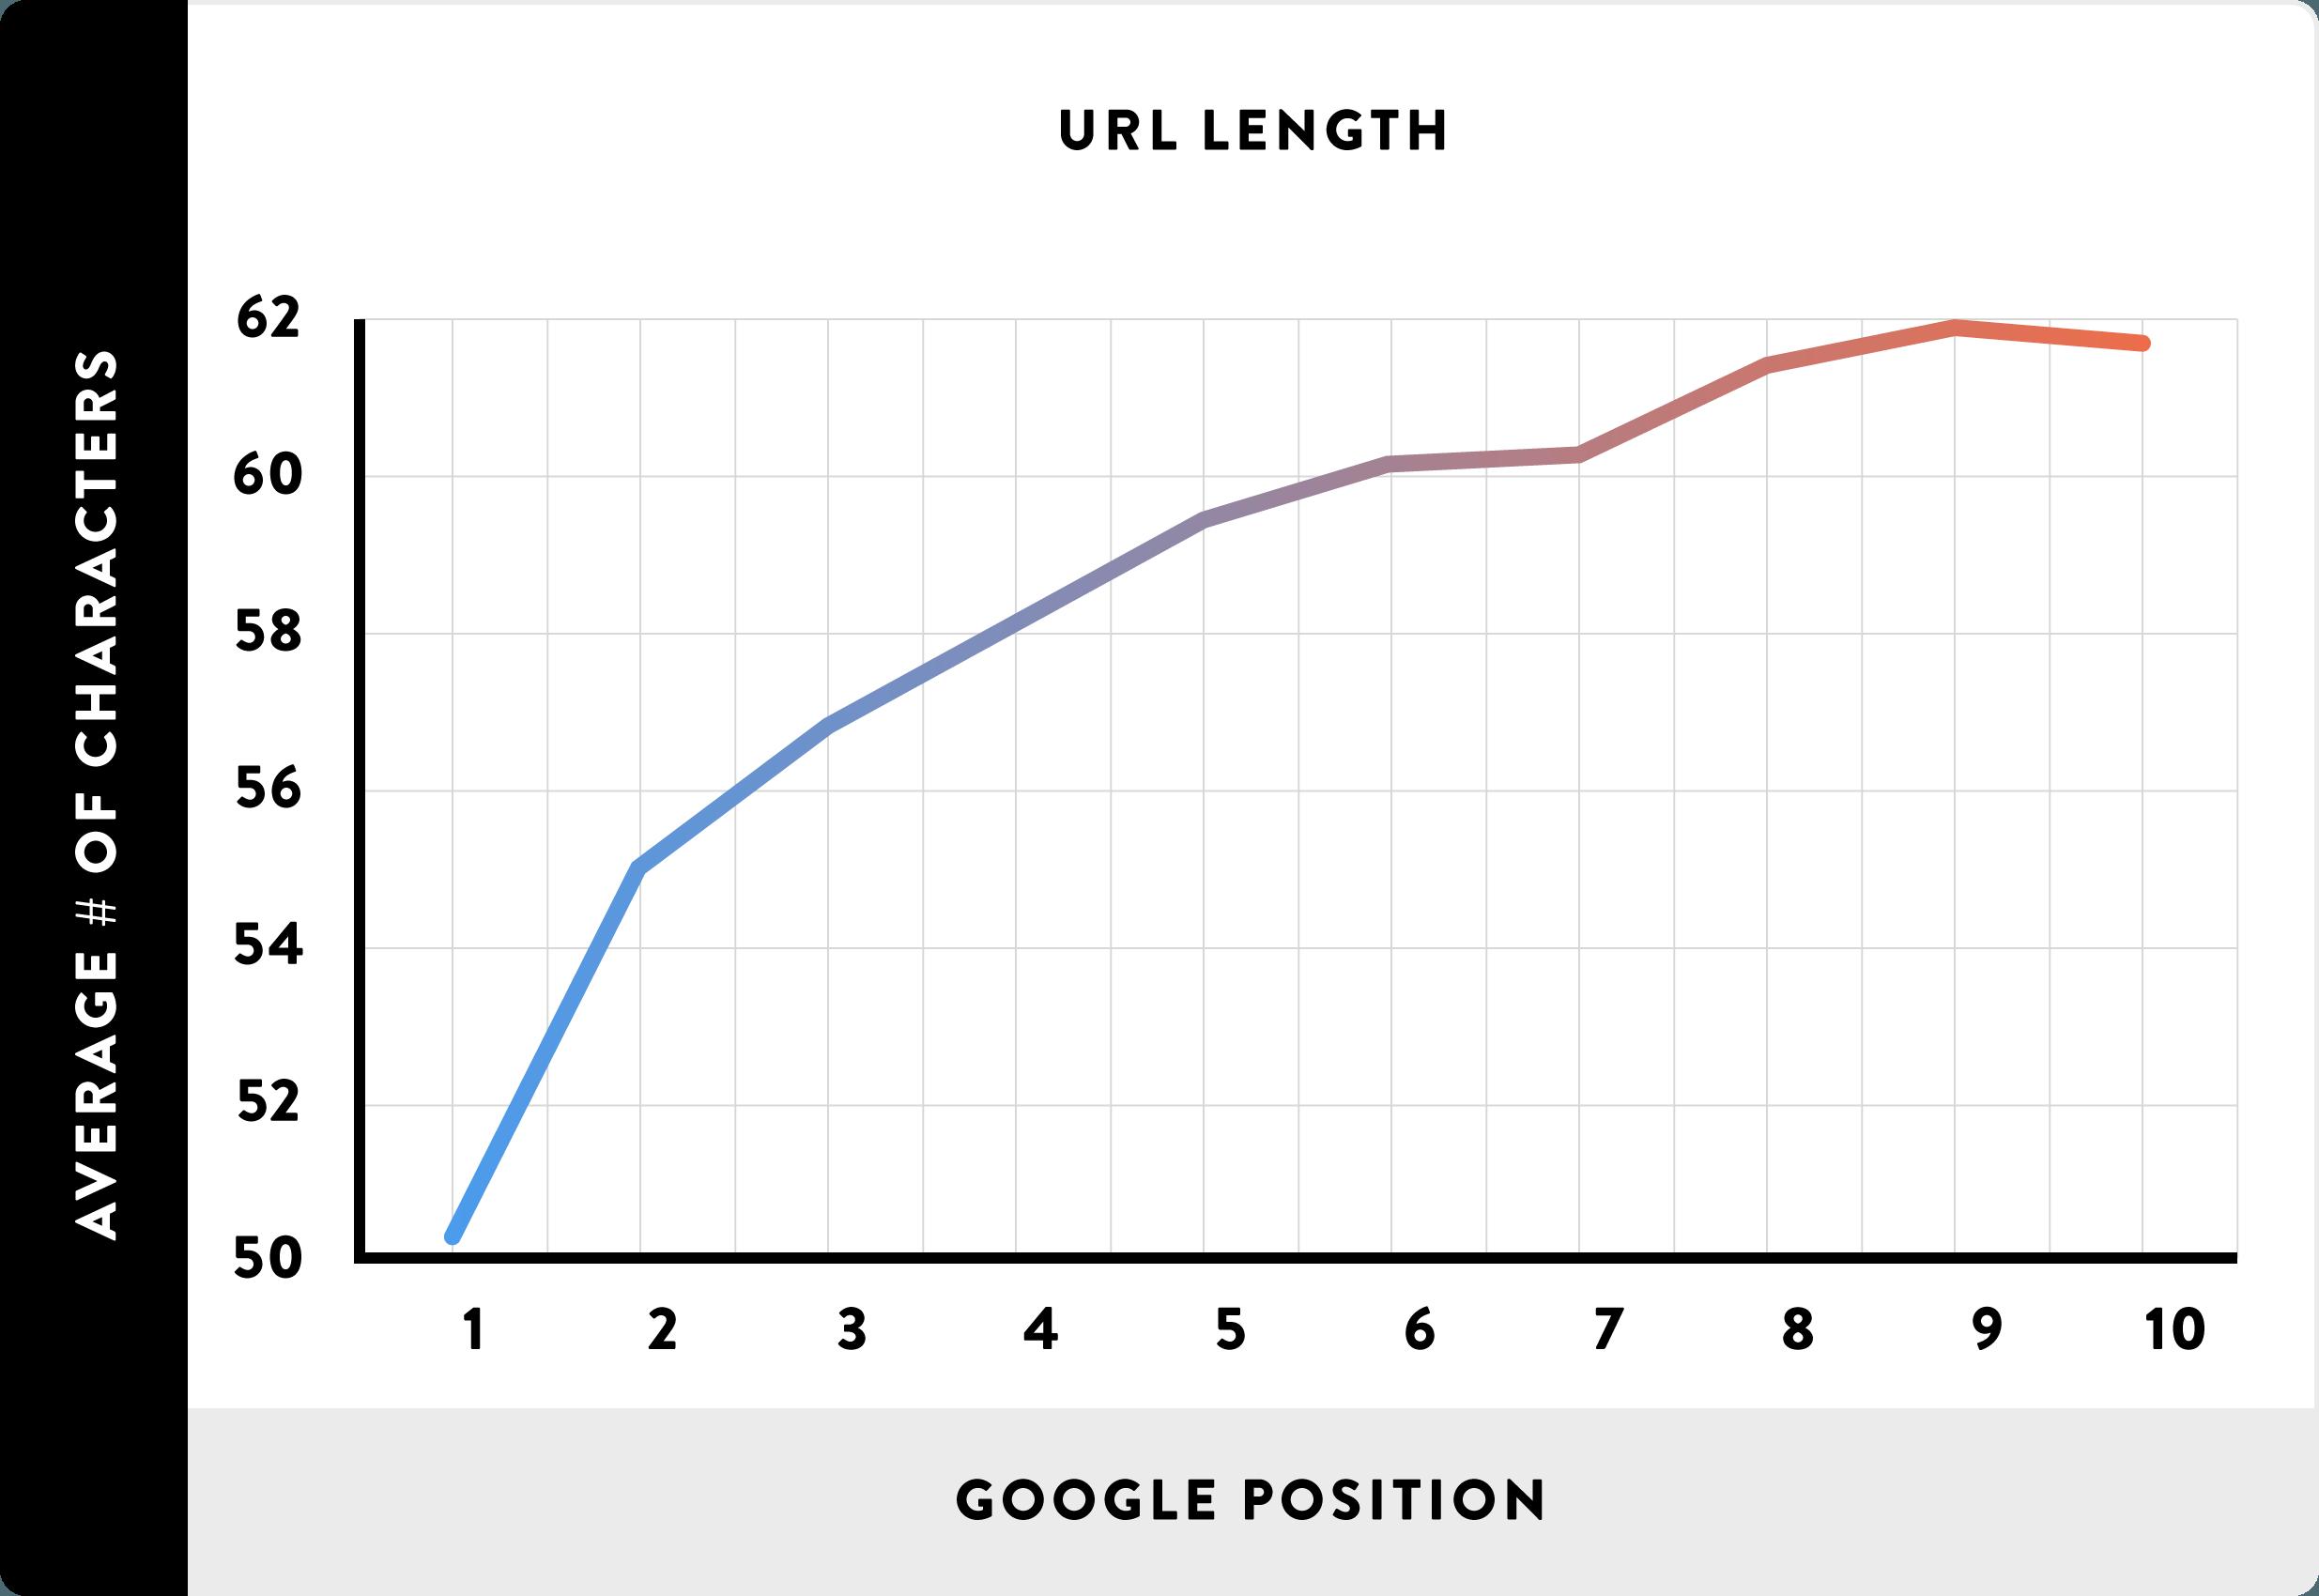 Short URLs are better than longer URLs